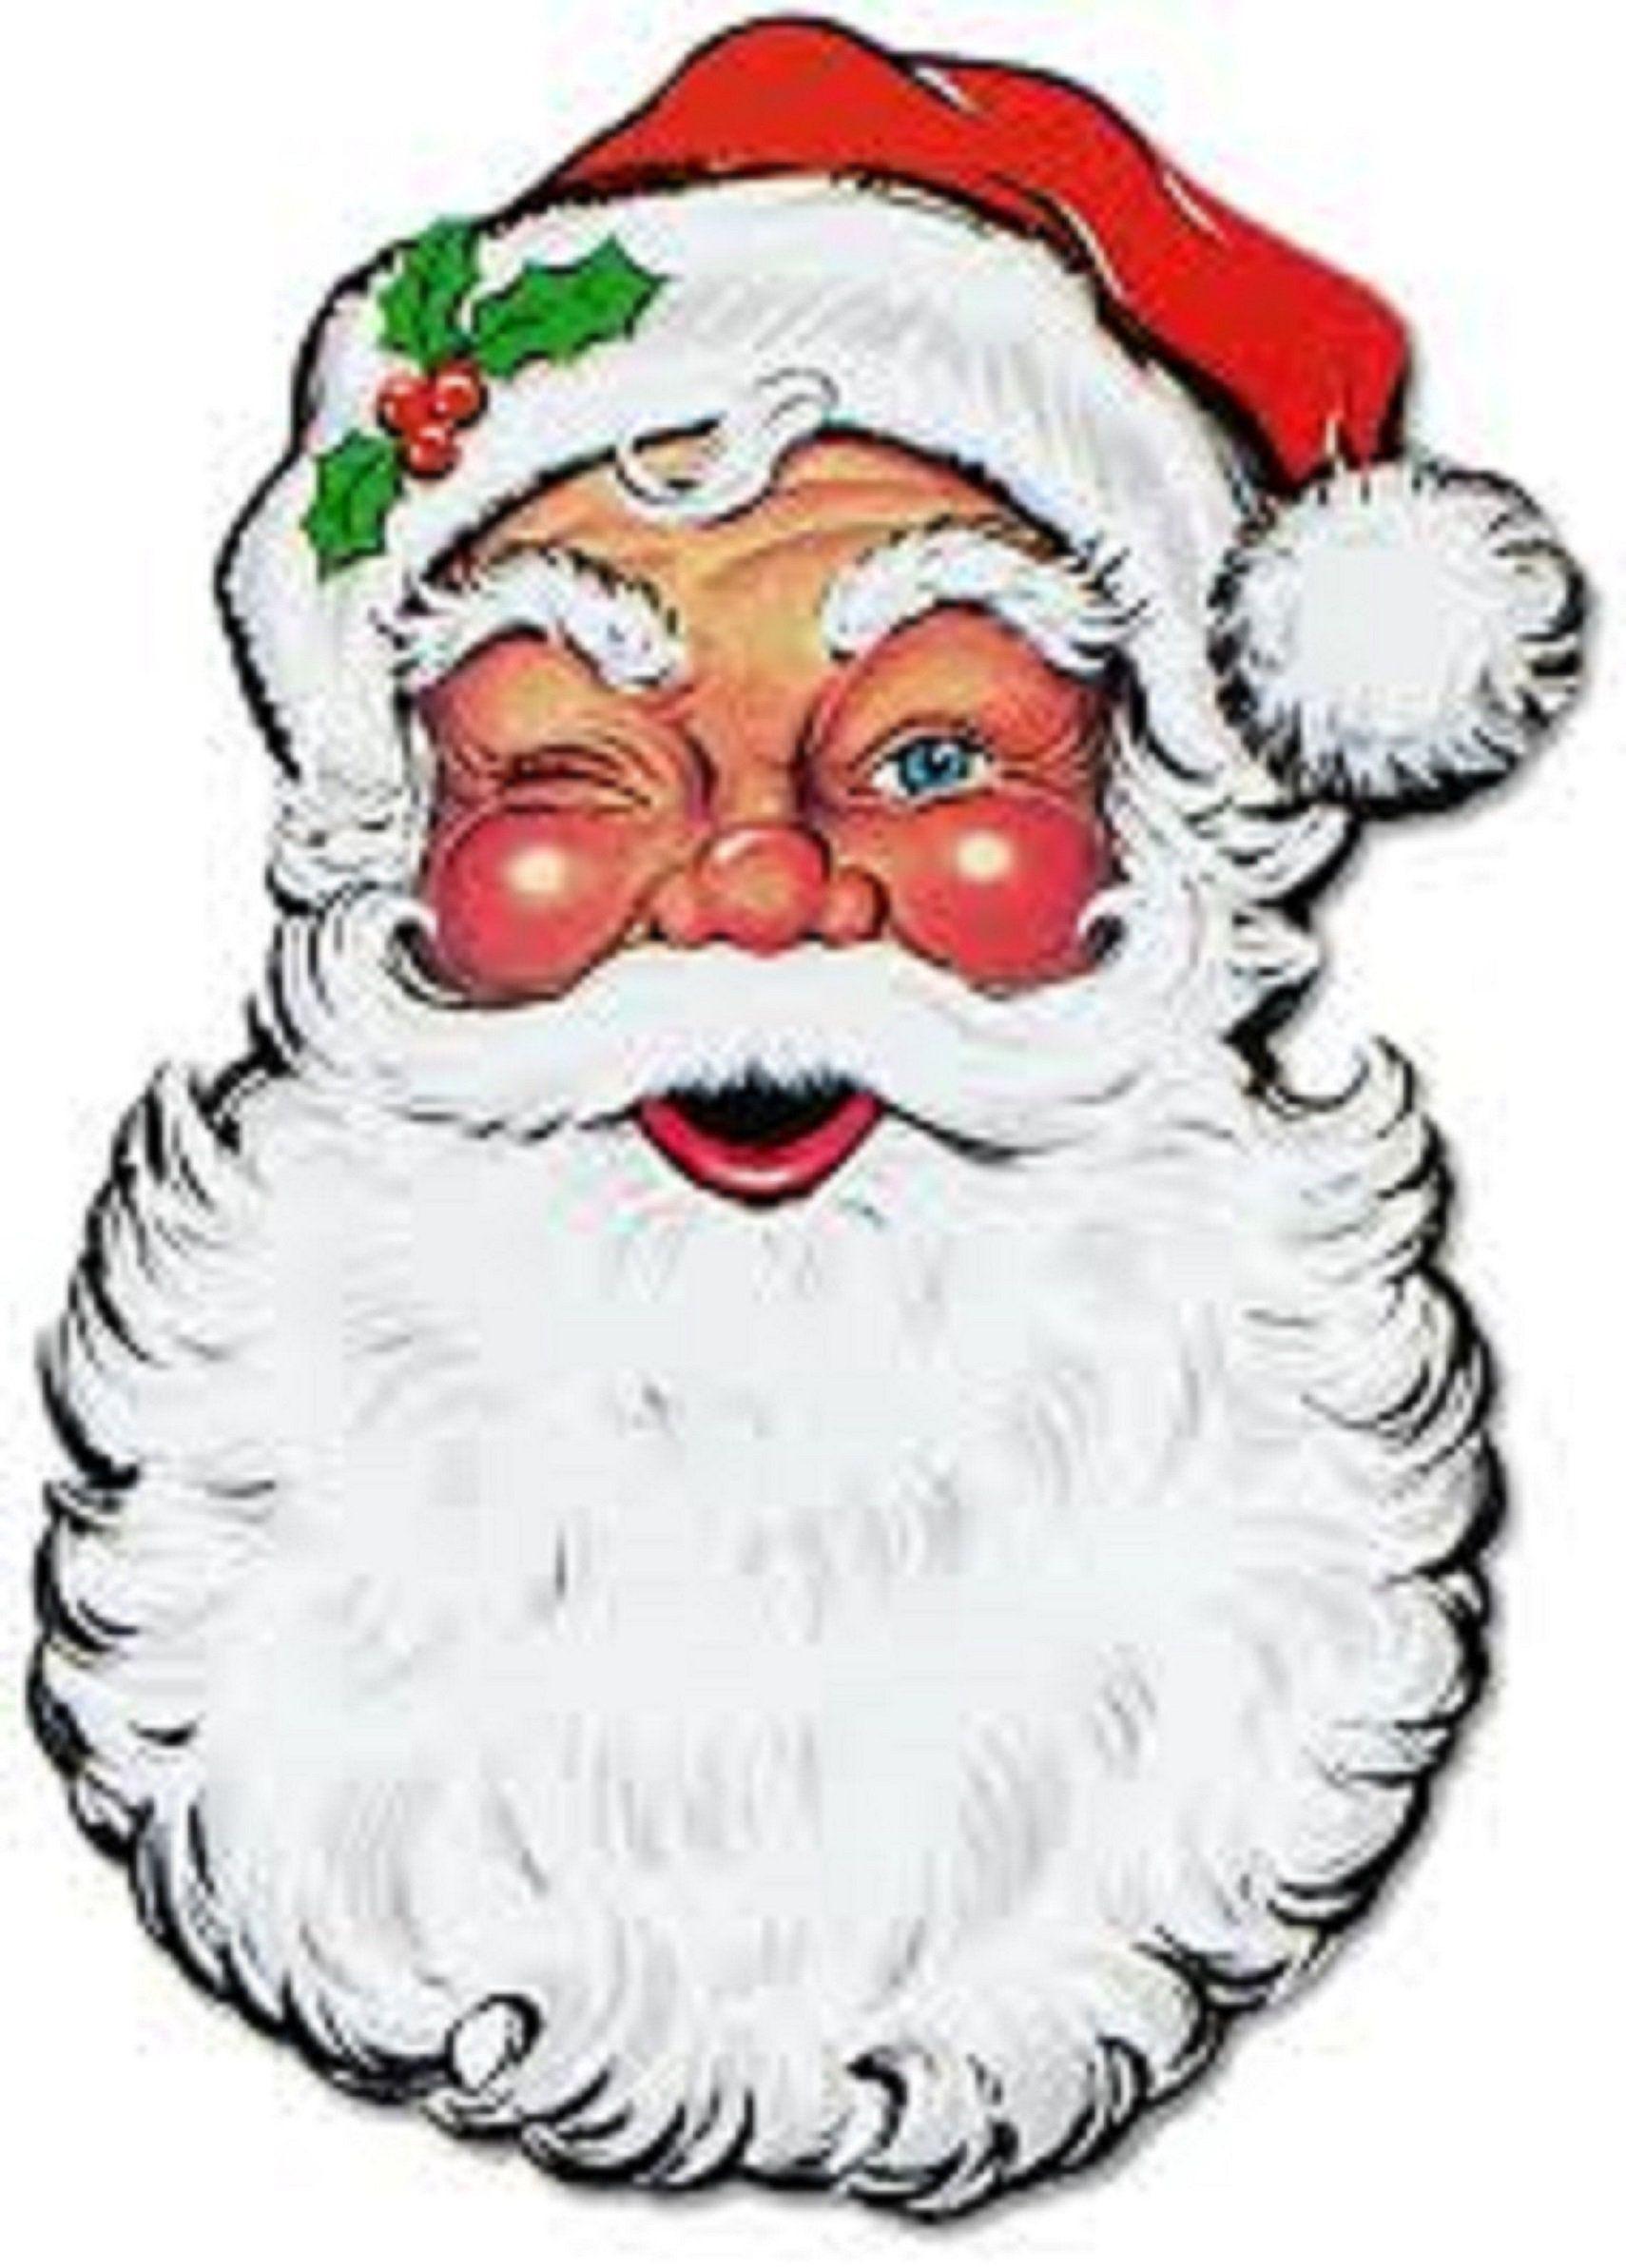 Winking Santa Claus Counted Cross Stitch Pattern Christmas.